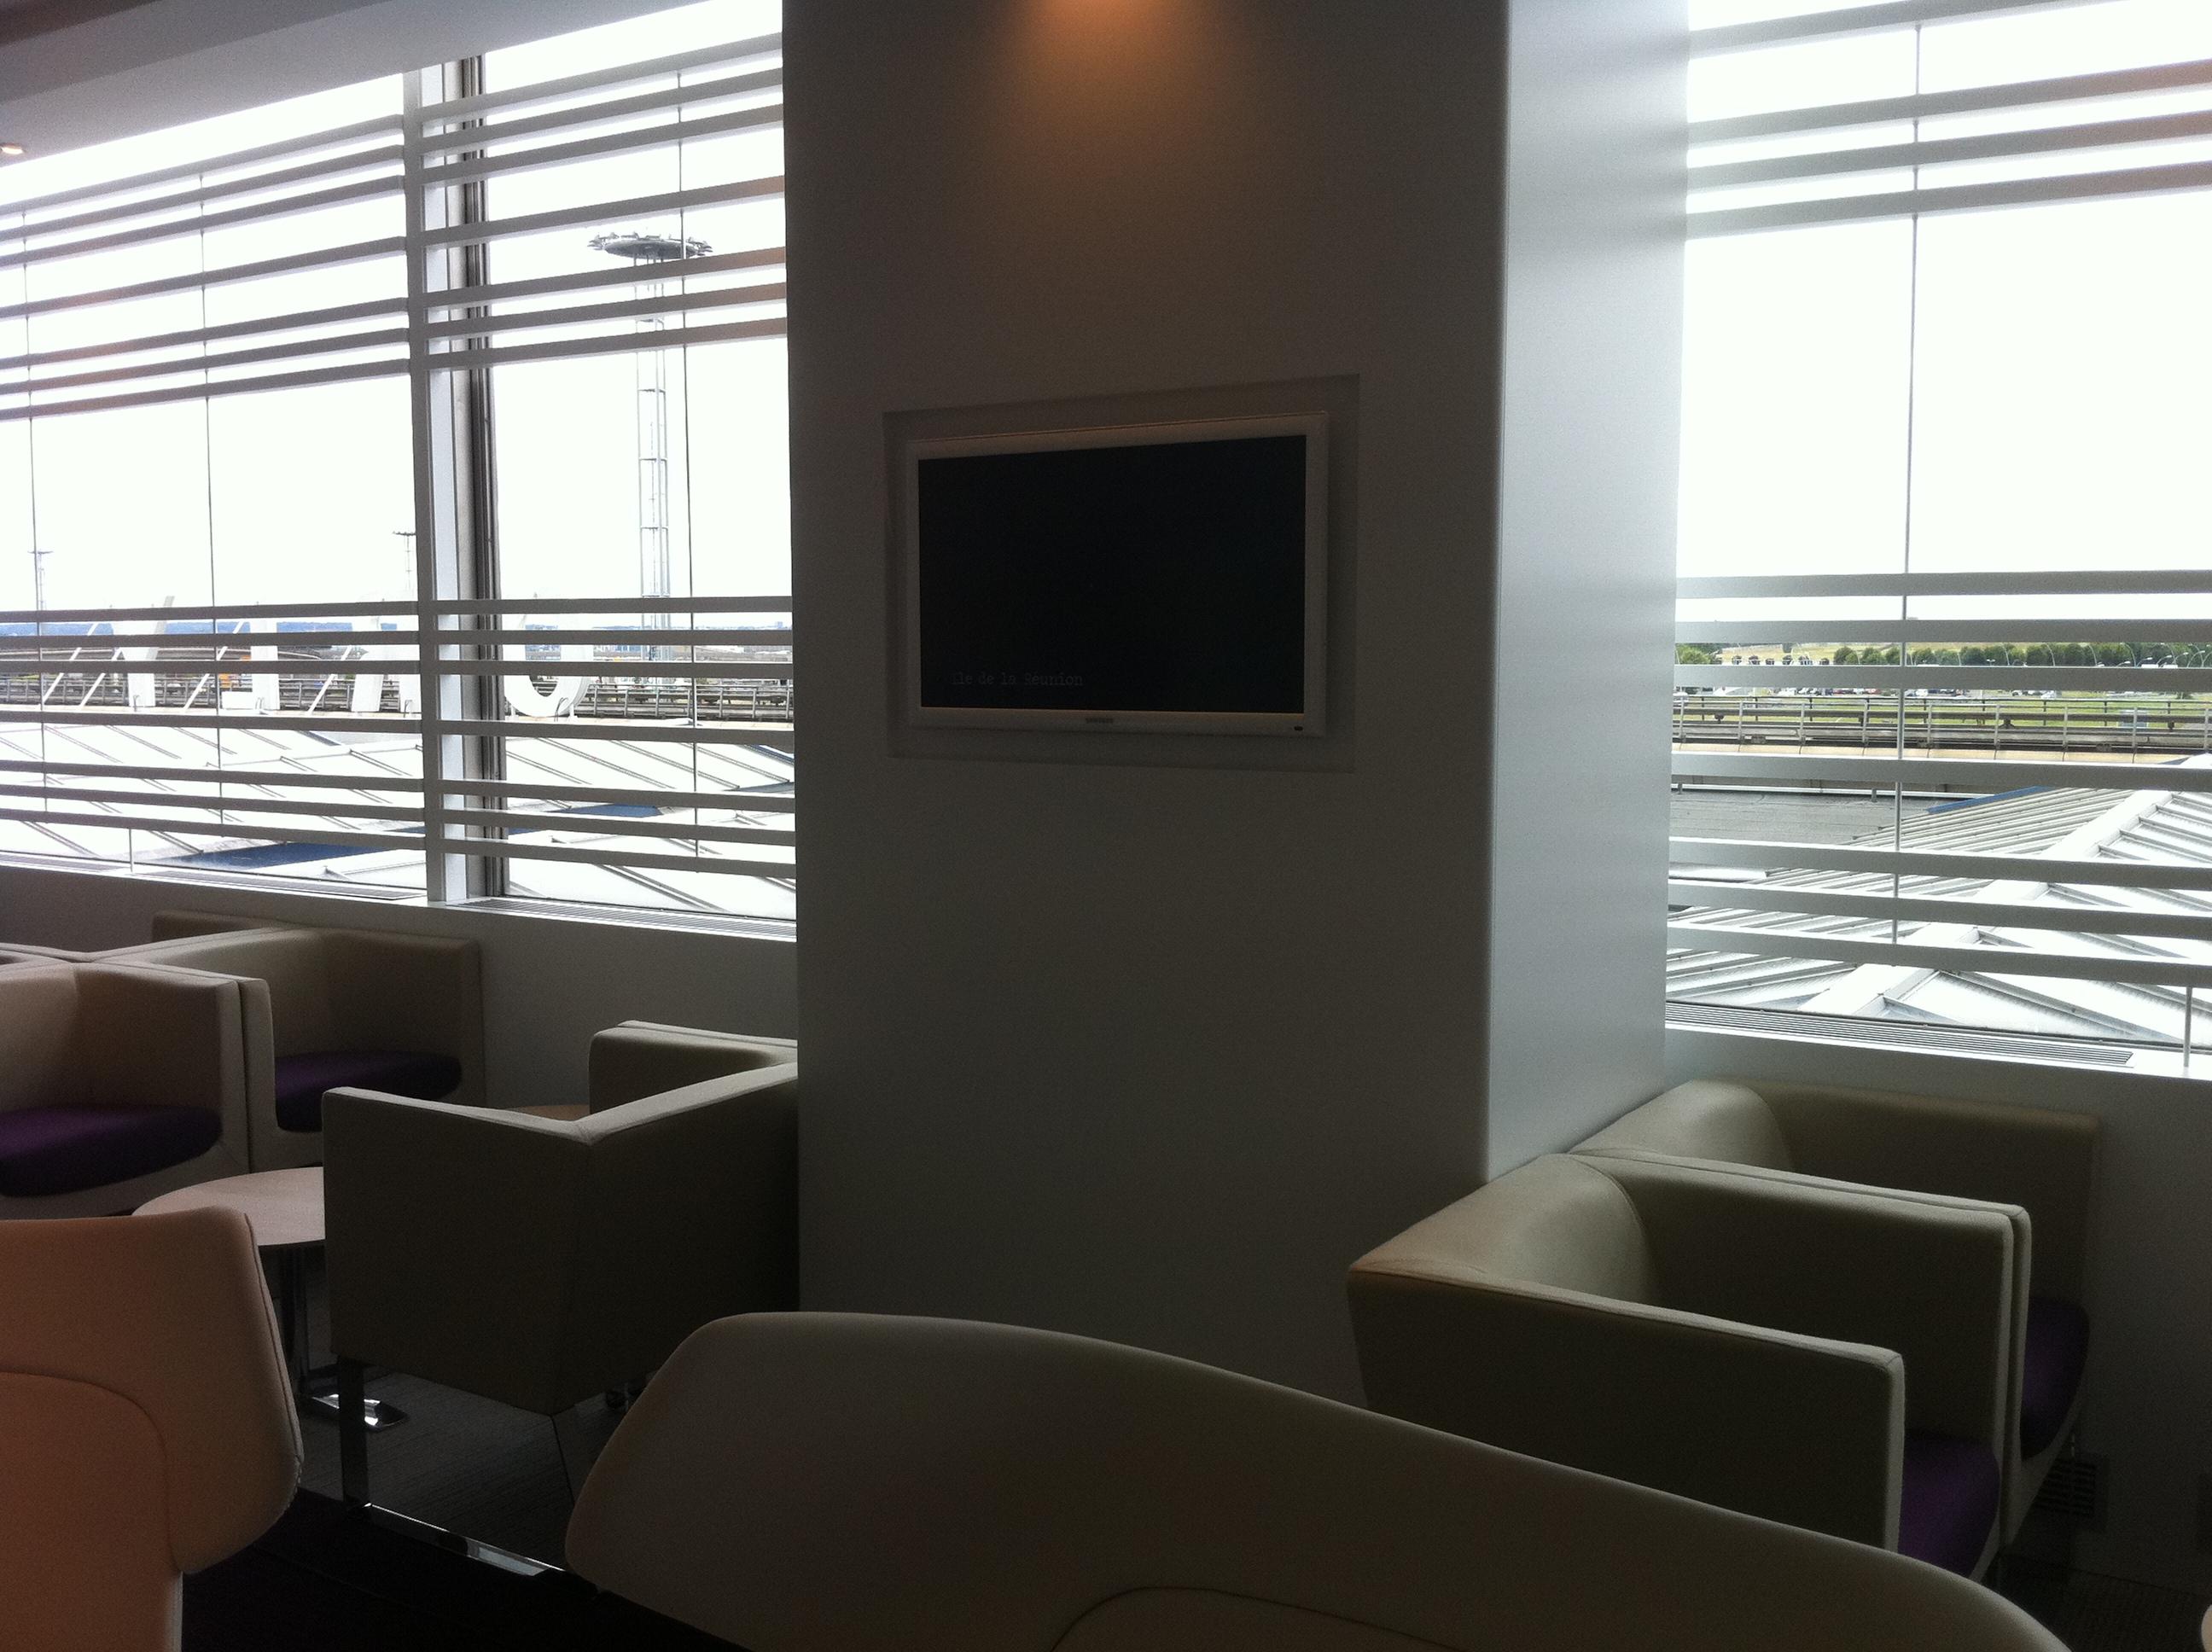 salle d embarquement corsair paris avs37 audio video service. Black Bedroom Furniture Sets. Home Design Ideas